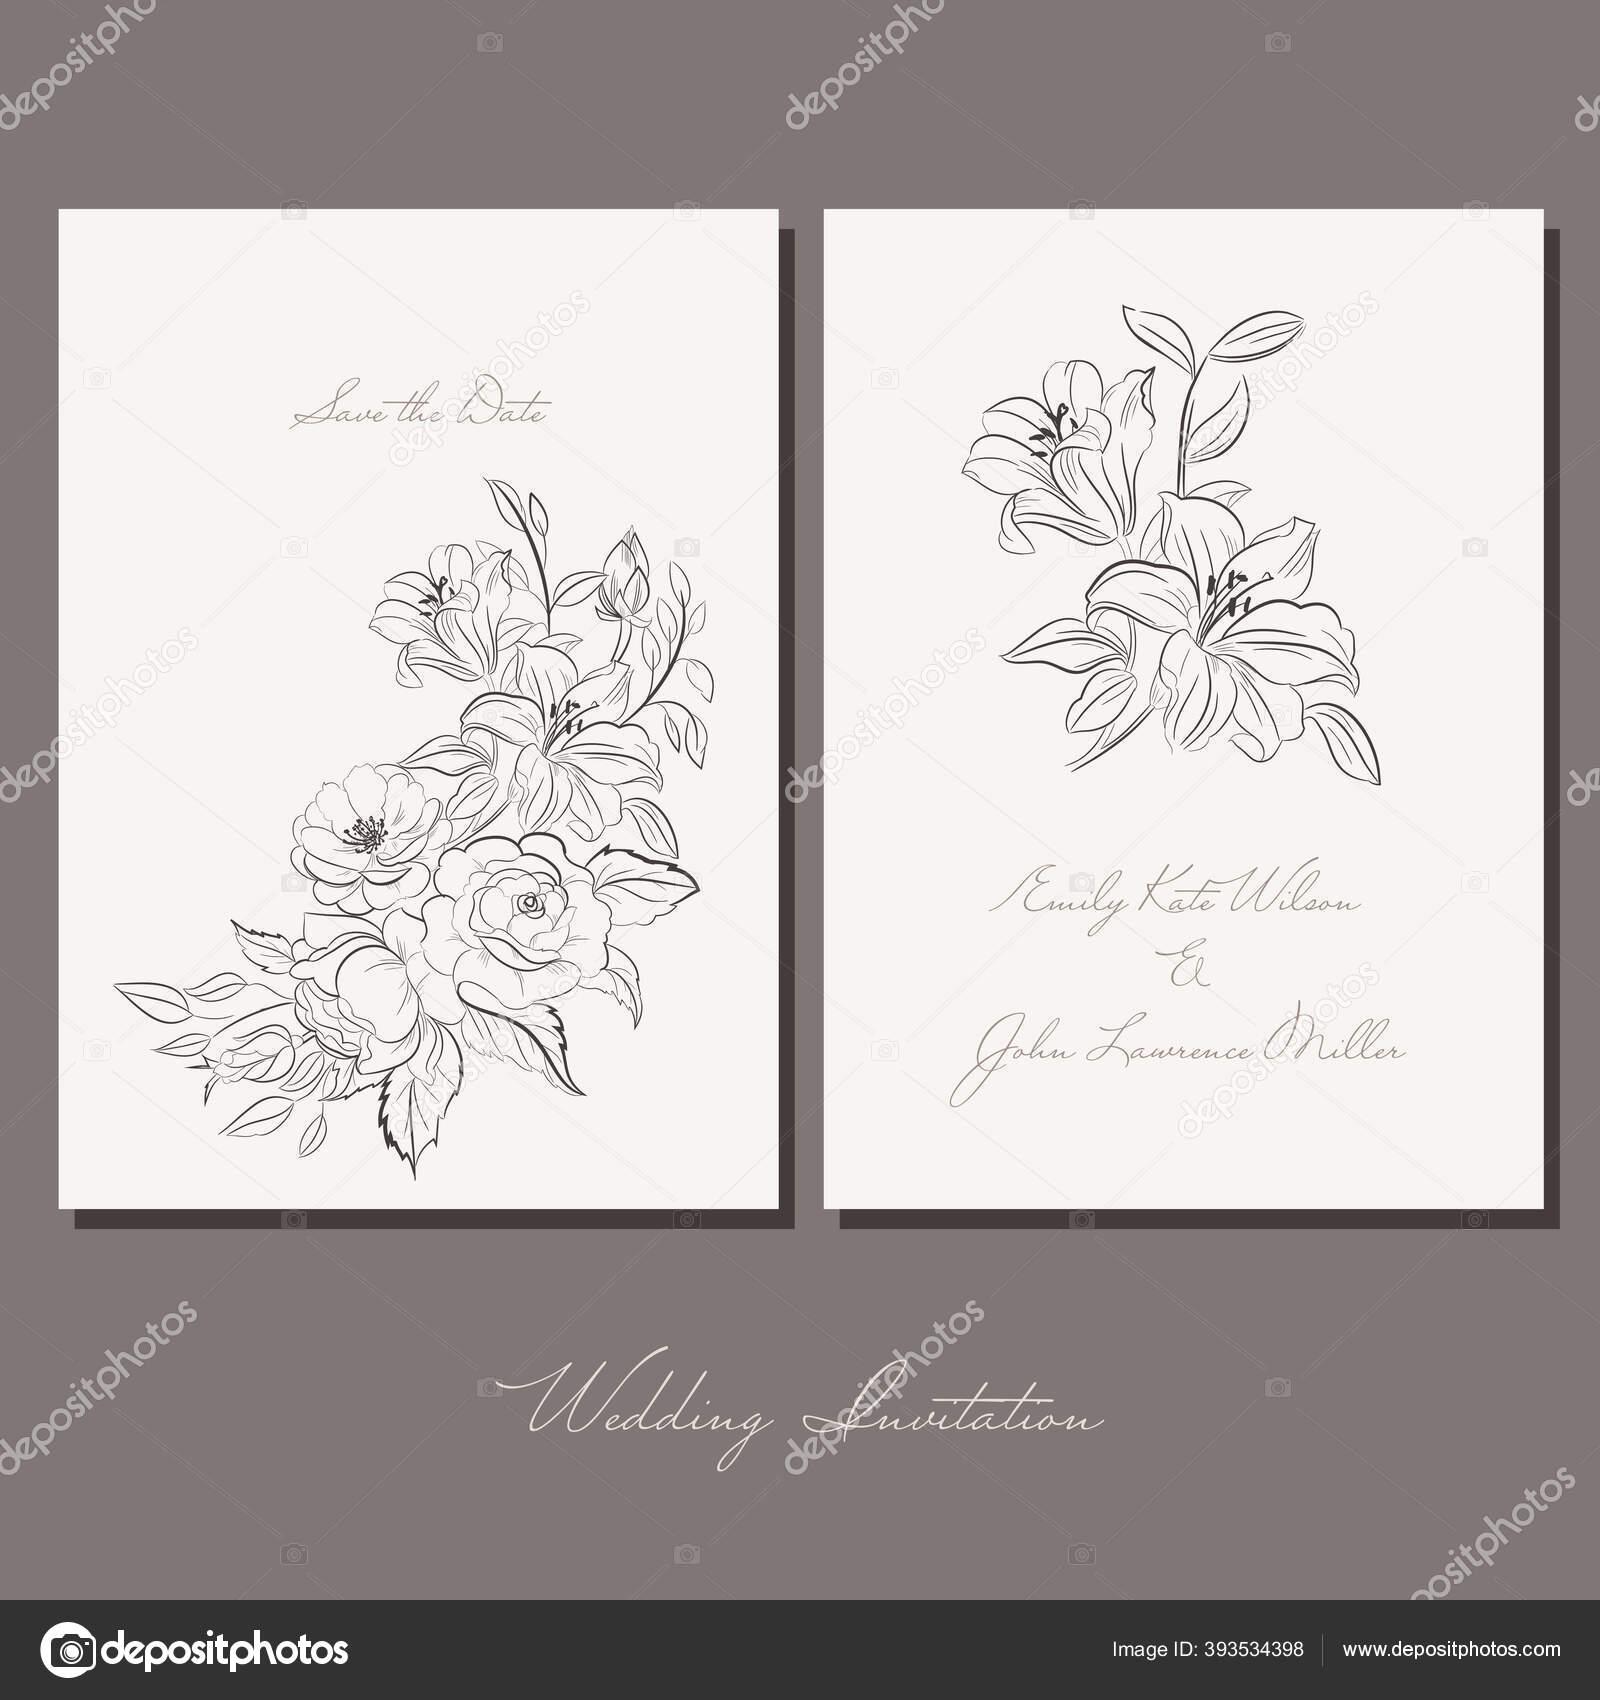 Wedding Cards Sketch Drawing Flowers Lettering Wedding Background Ink Pen Stock Vector C Vasimila 393534398